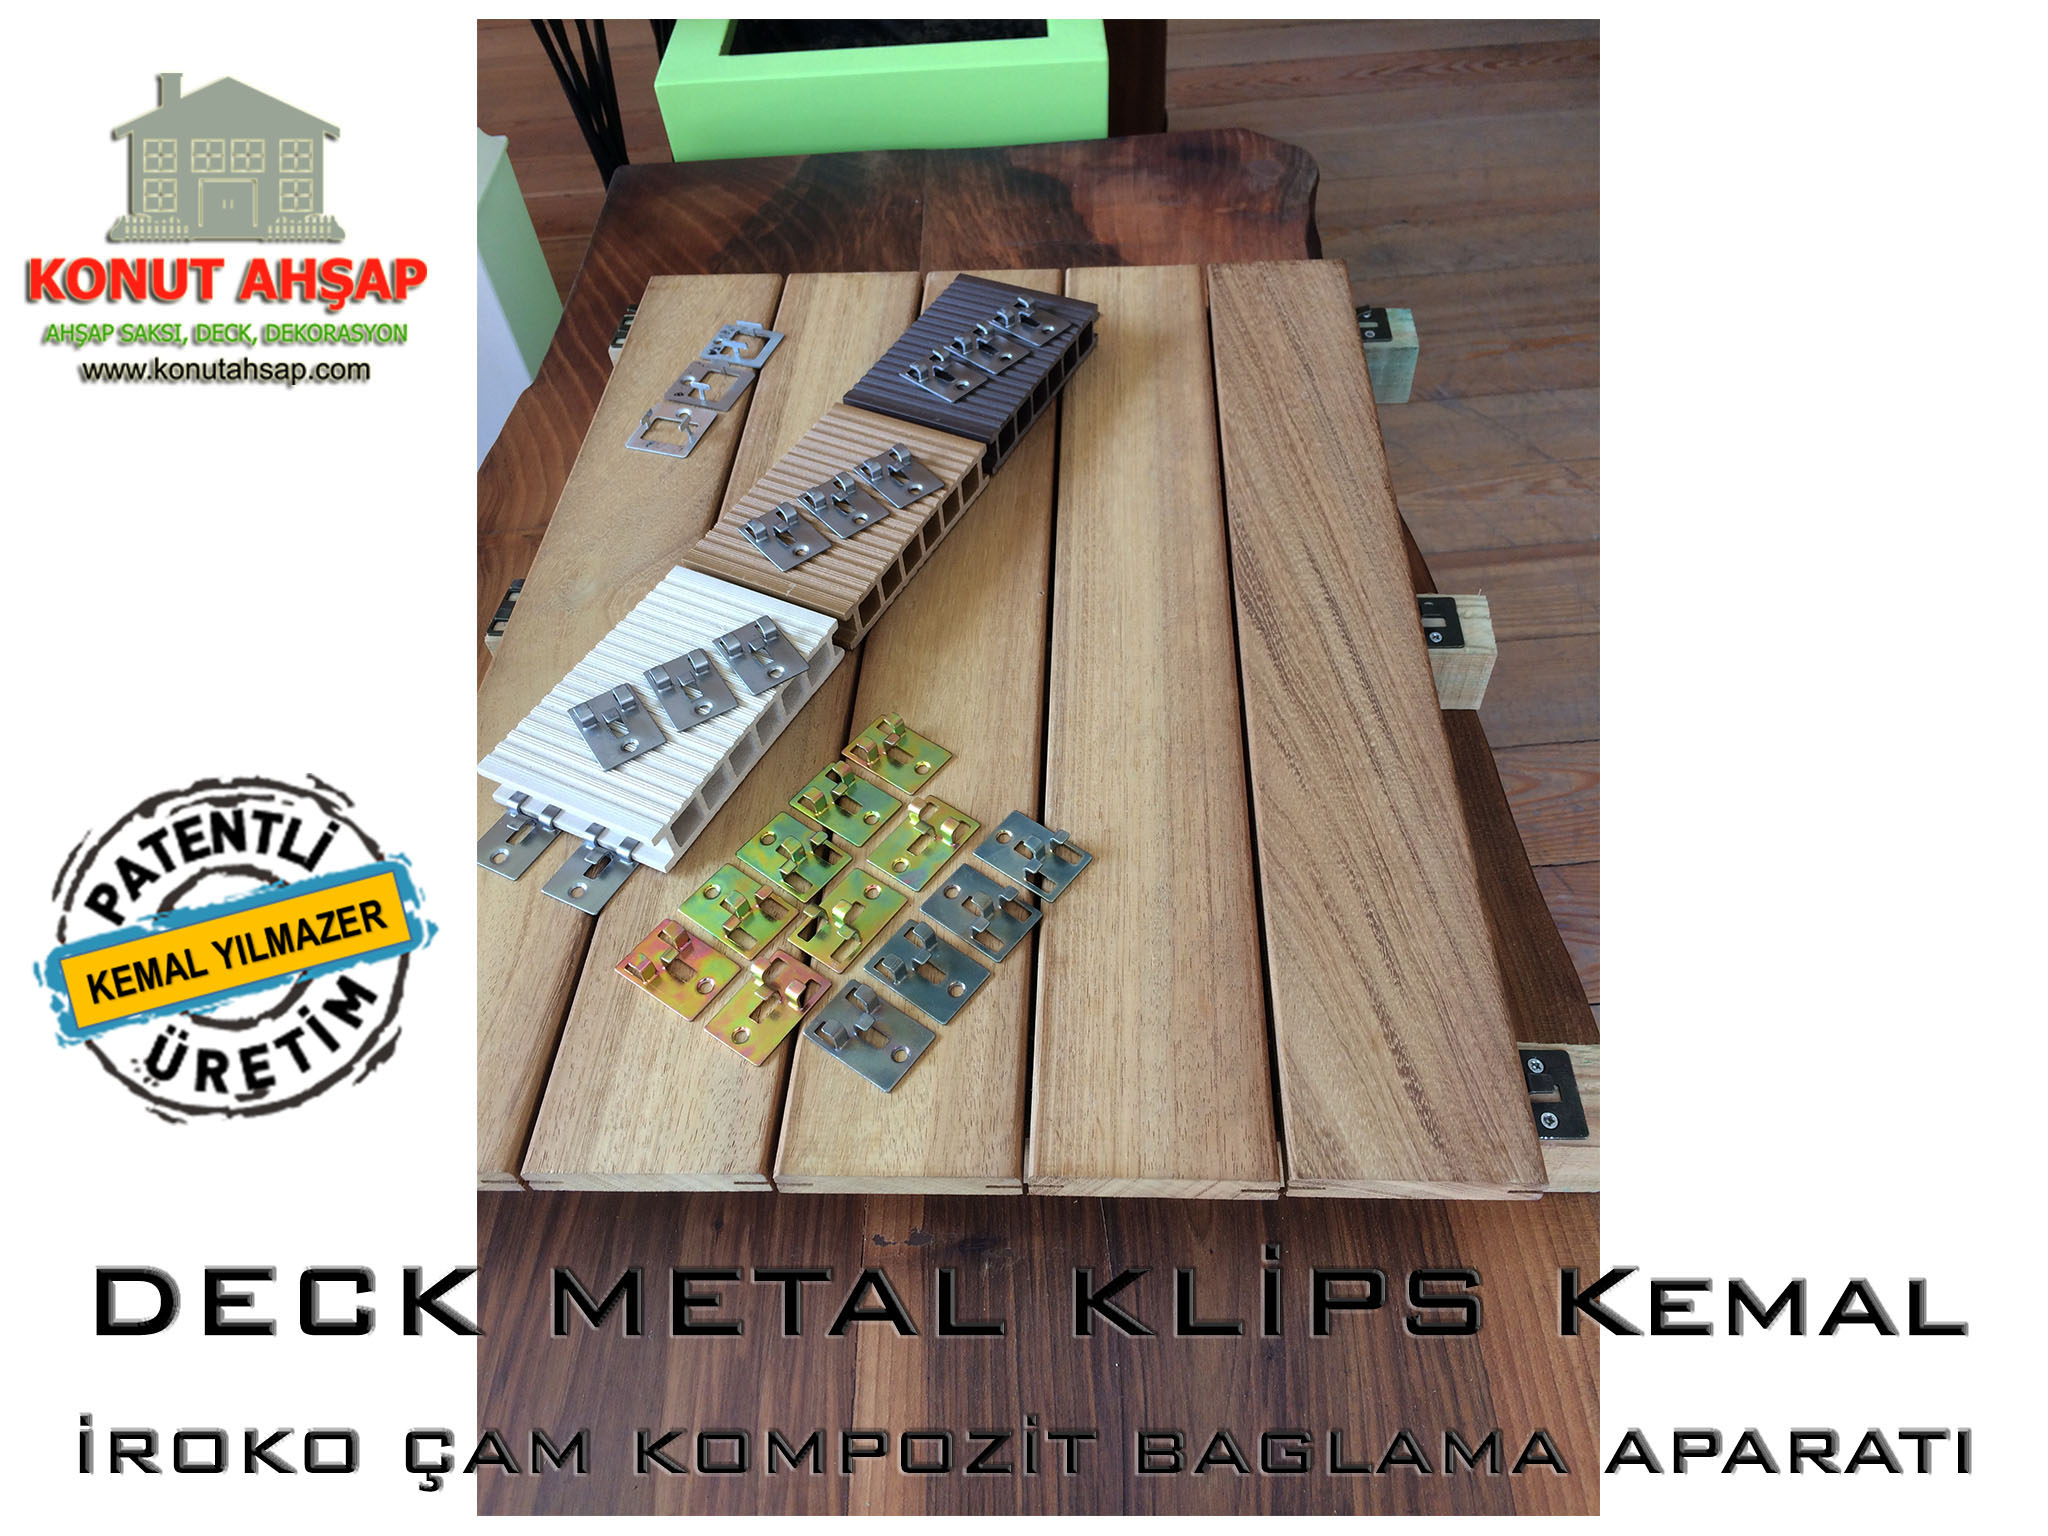 Deck Metal